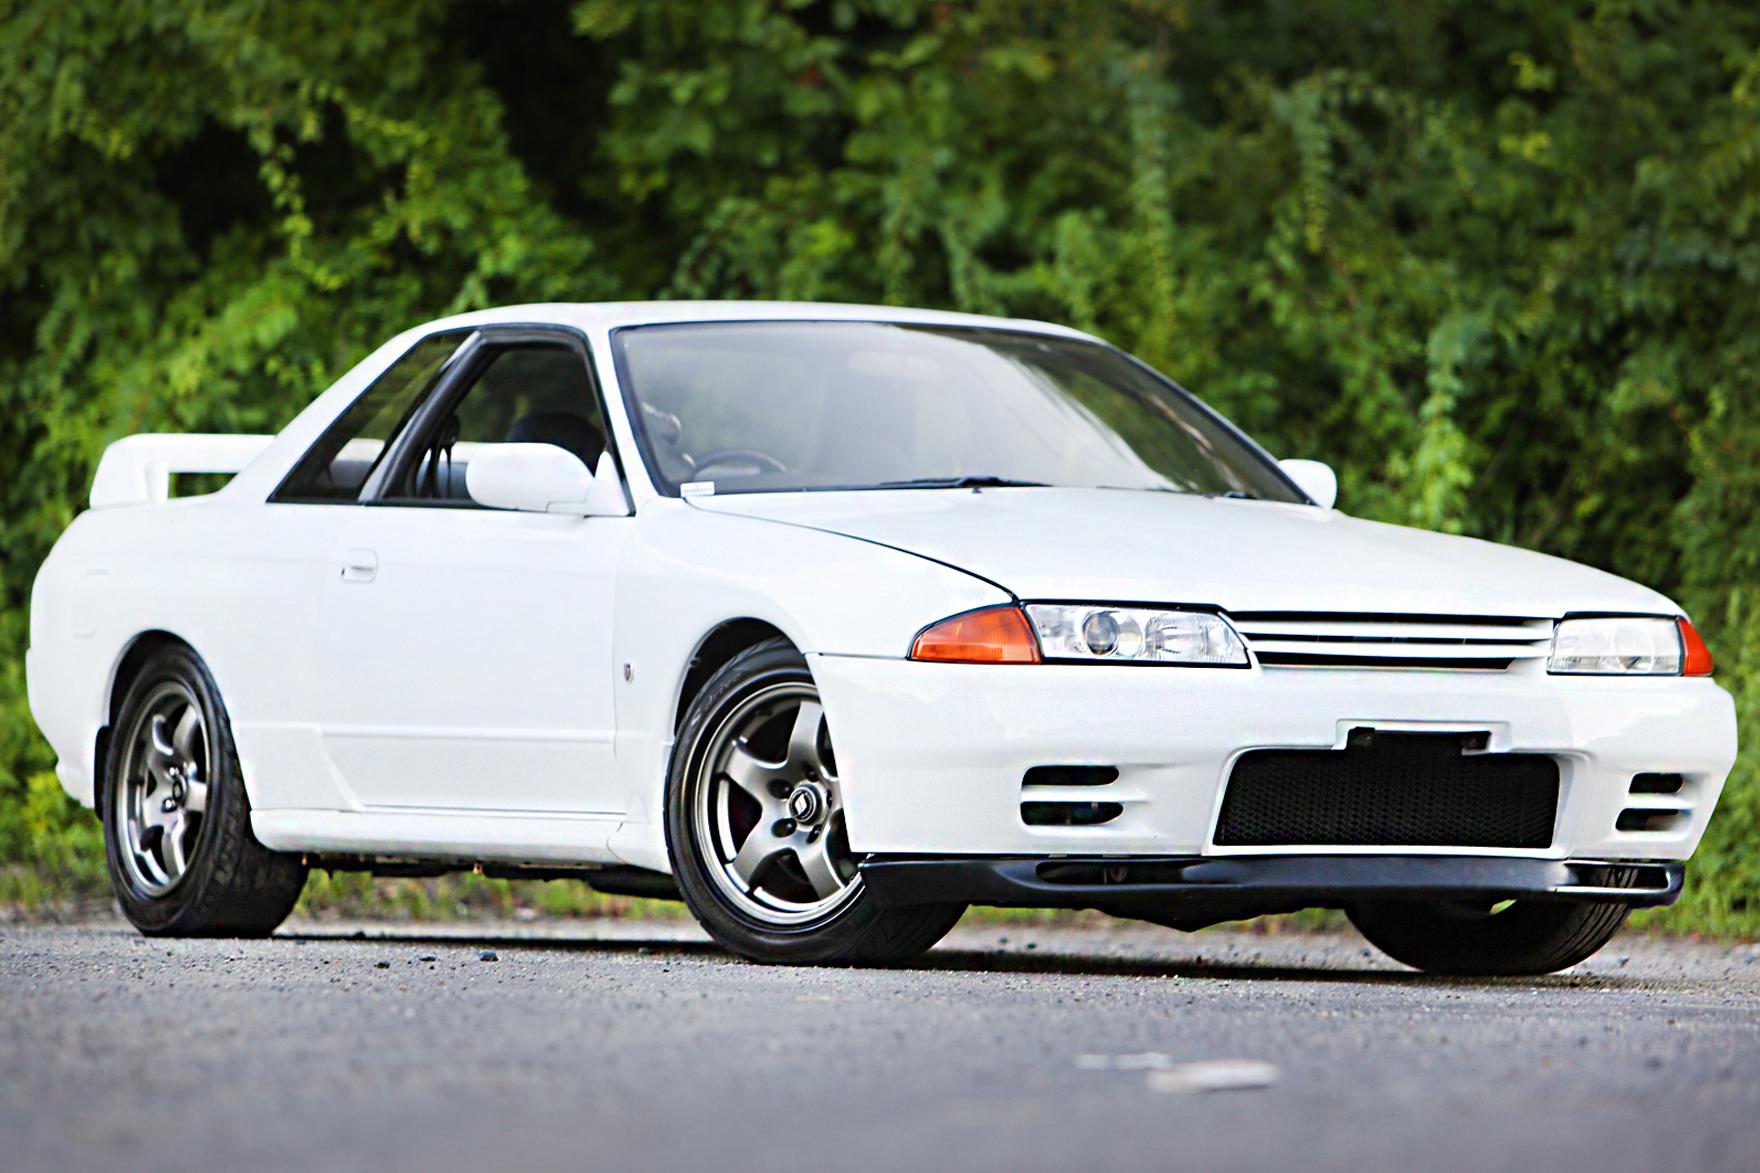 1992 Nissan Skyline R32 GTR - $26,500